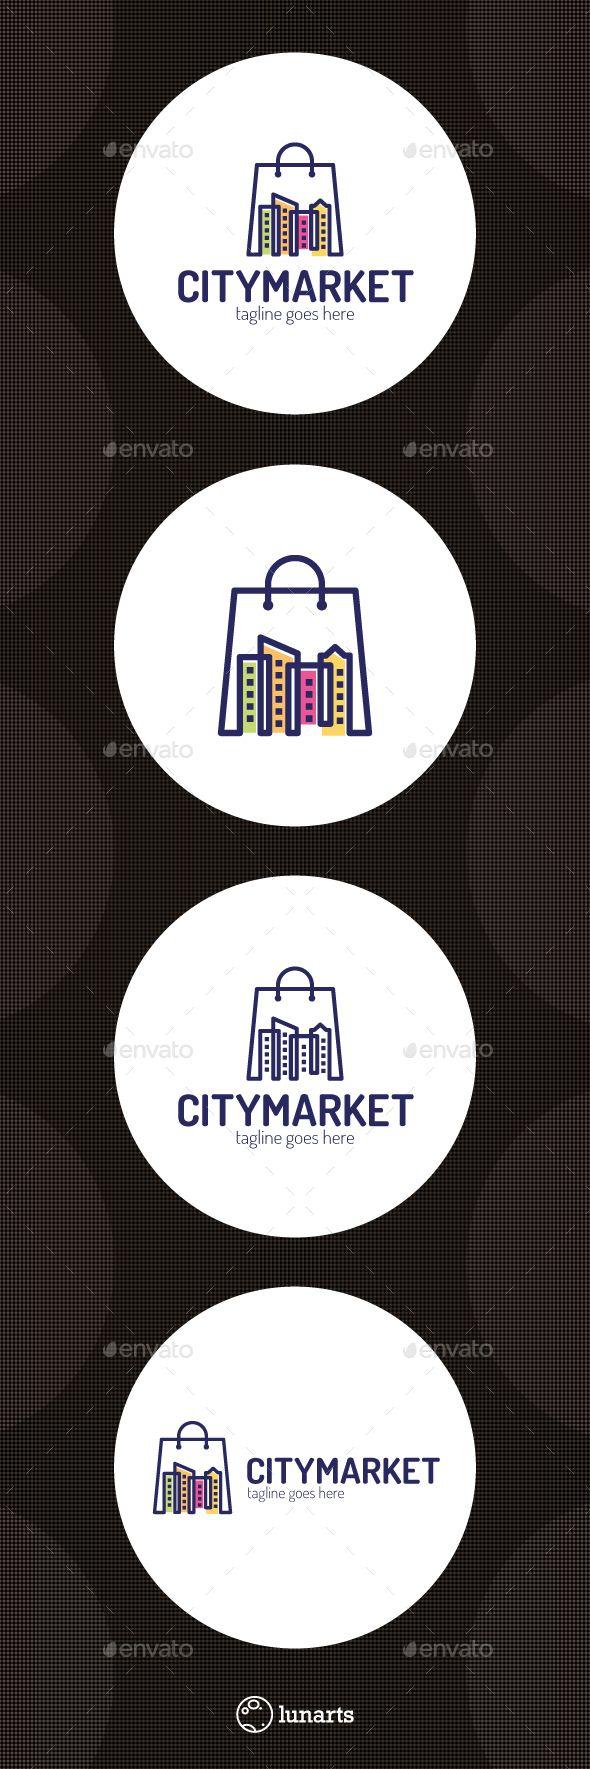 City Store Logo Template Vector EPS, AI. Download here: http://graphicriver.net/item/city-store-logo/14367839?ref=ksioks